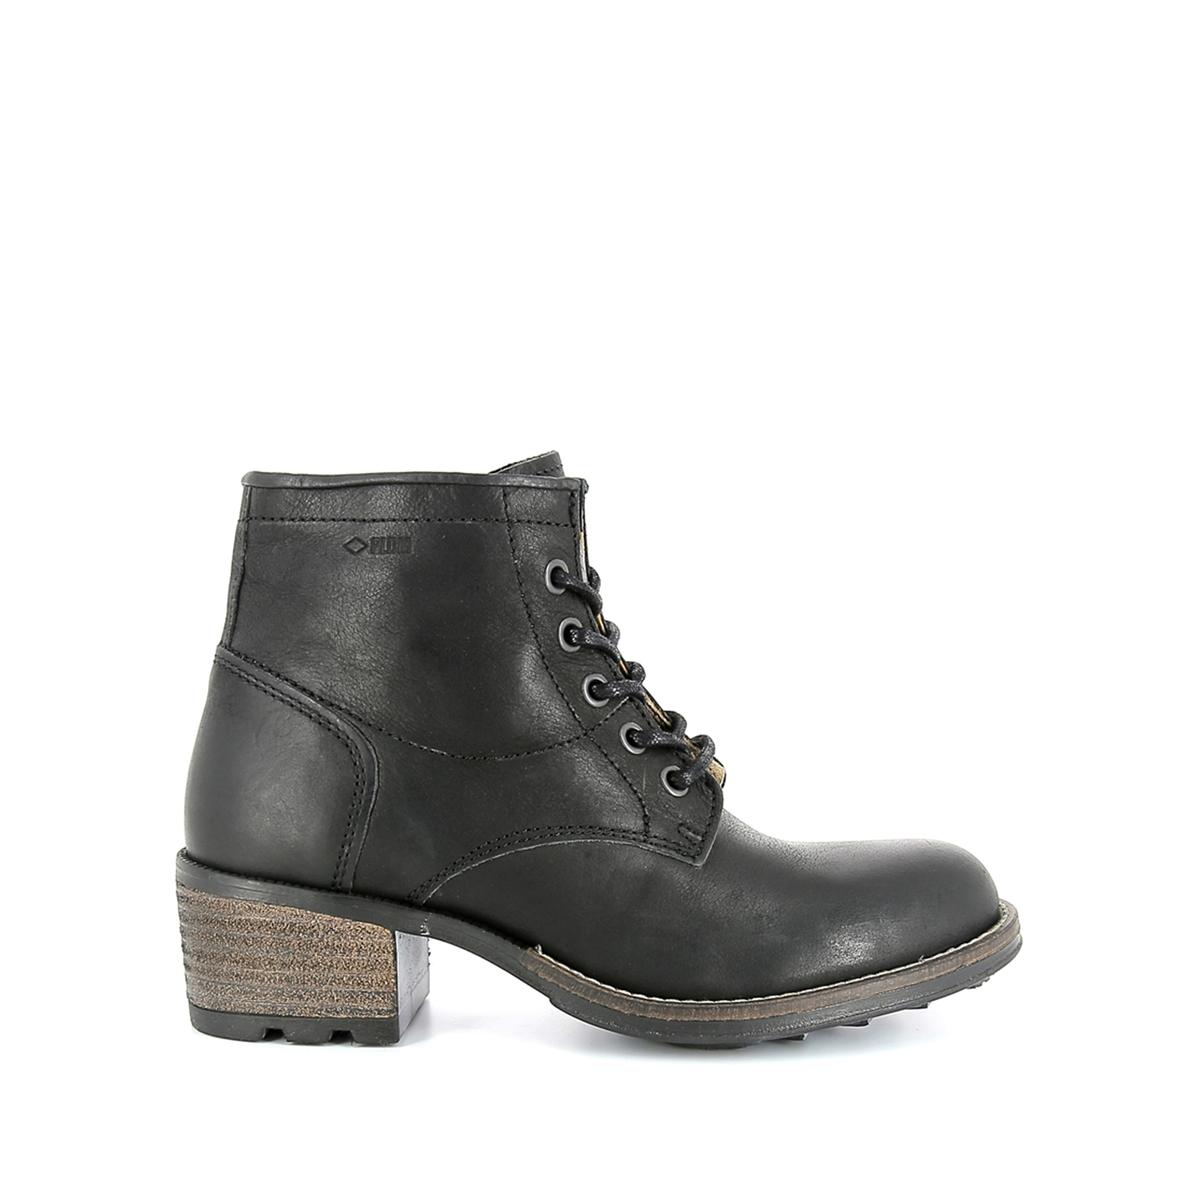 Ботинки из кожи на каблуке Carthy ботинки mariamare ботинки на каблуке